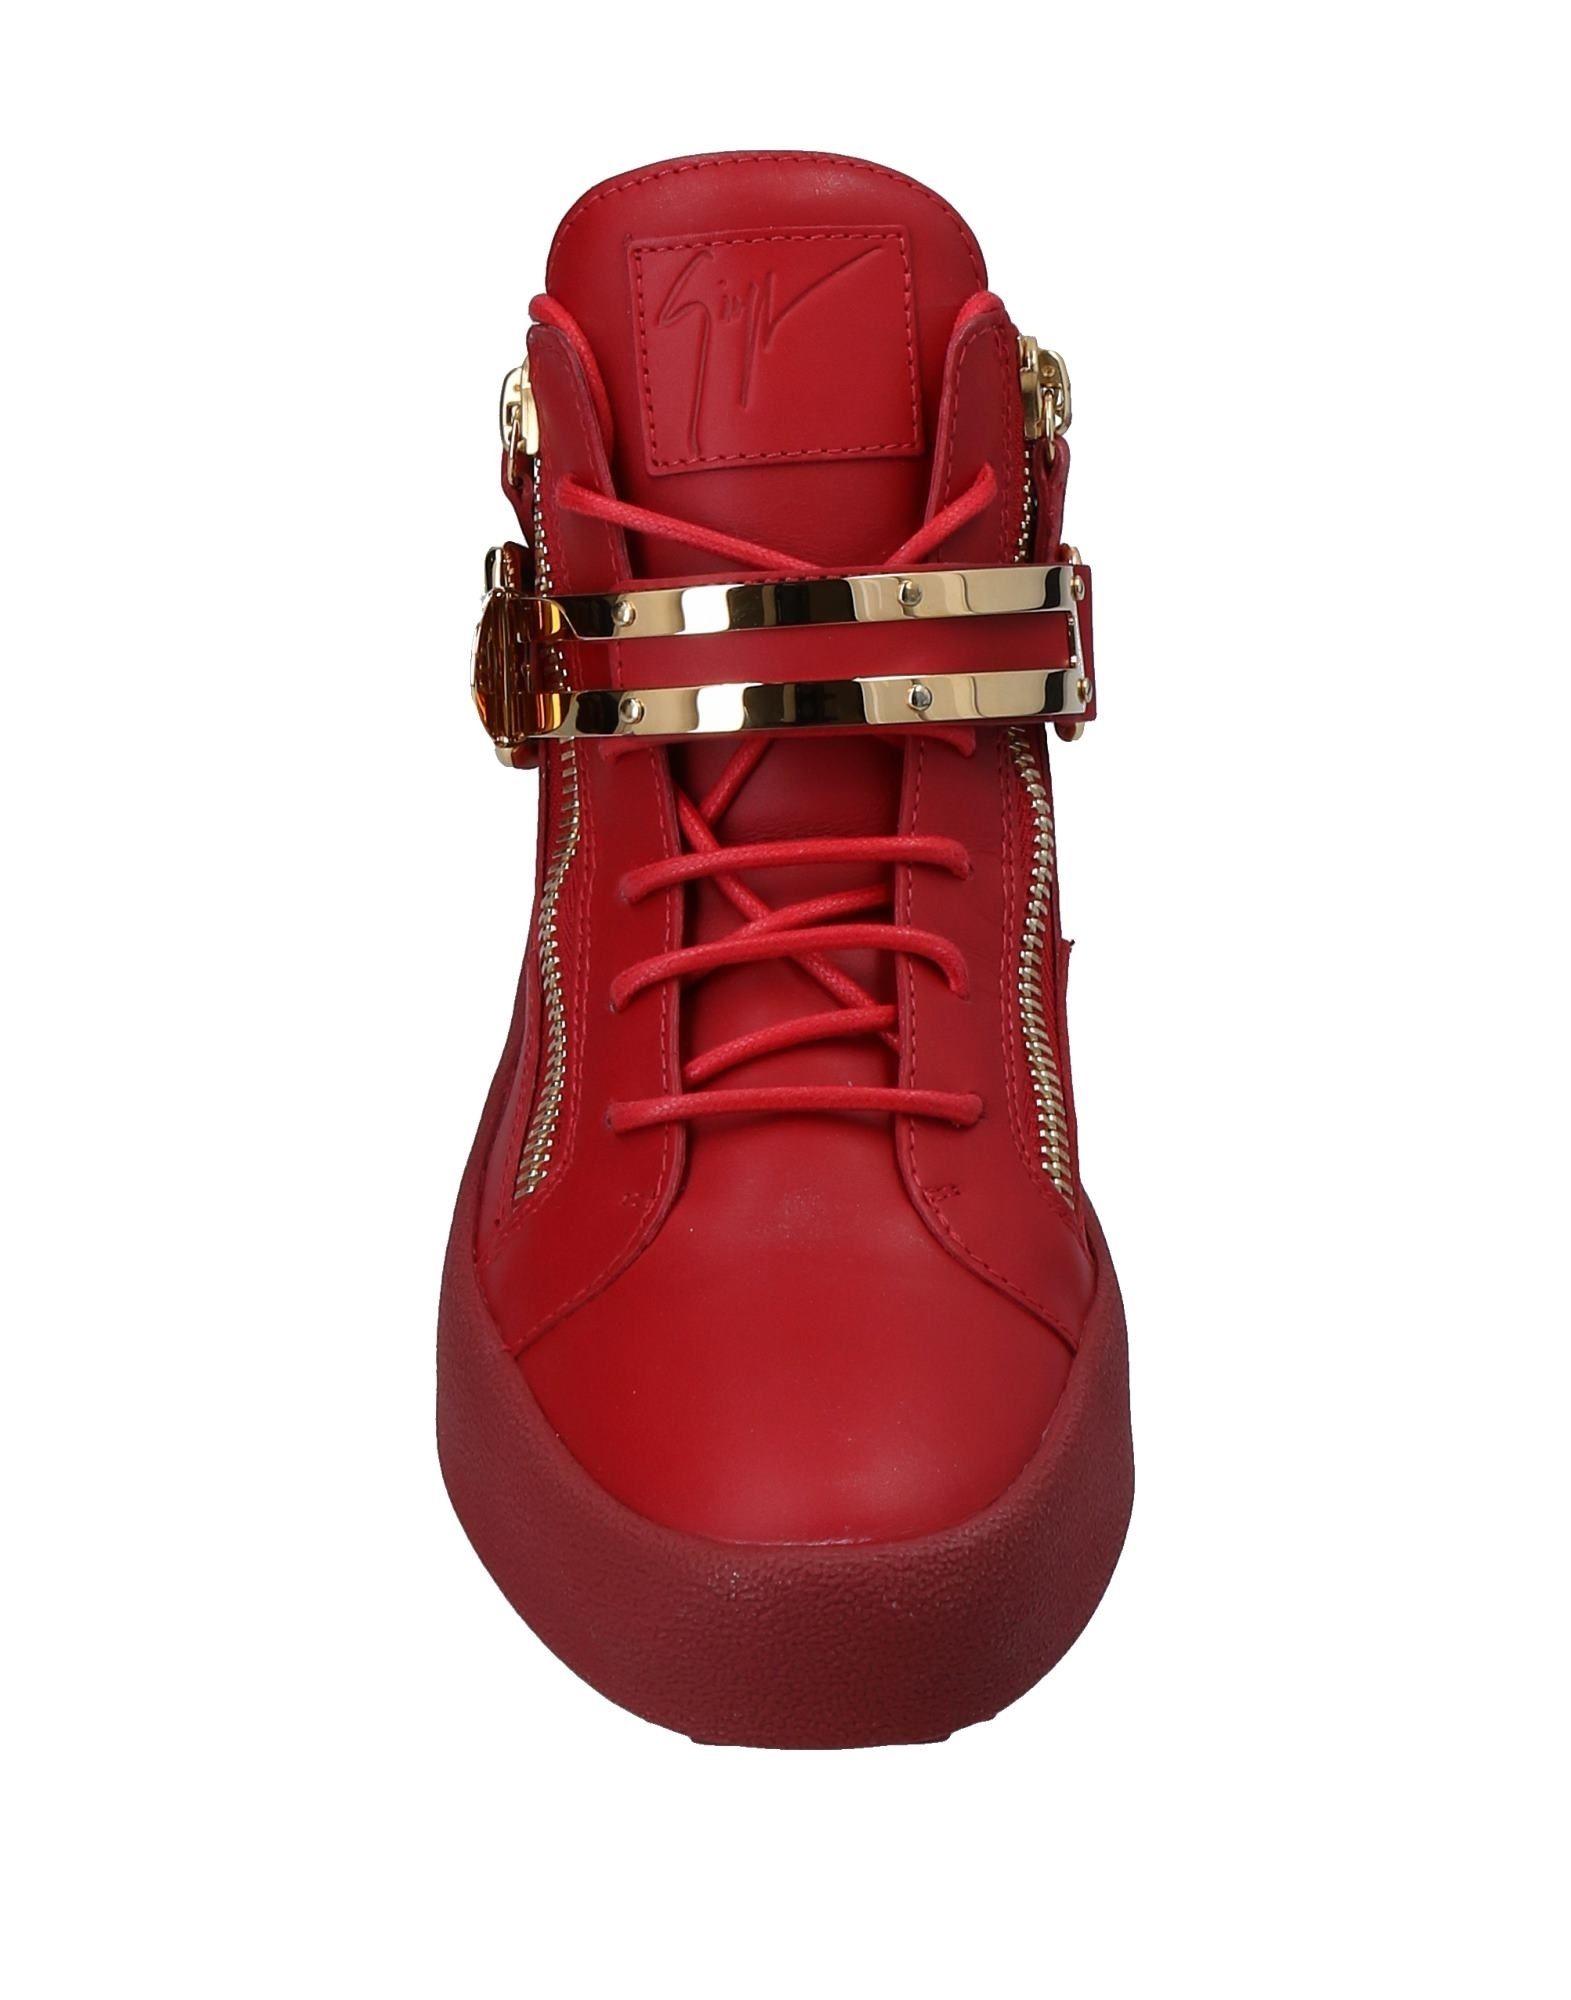 Giuseppe Zanotti Sneakers Herren beliebte  11555457DQ Gute Qualität beliebte Herren Schuhe 3f8e41